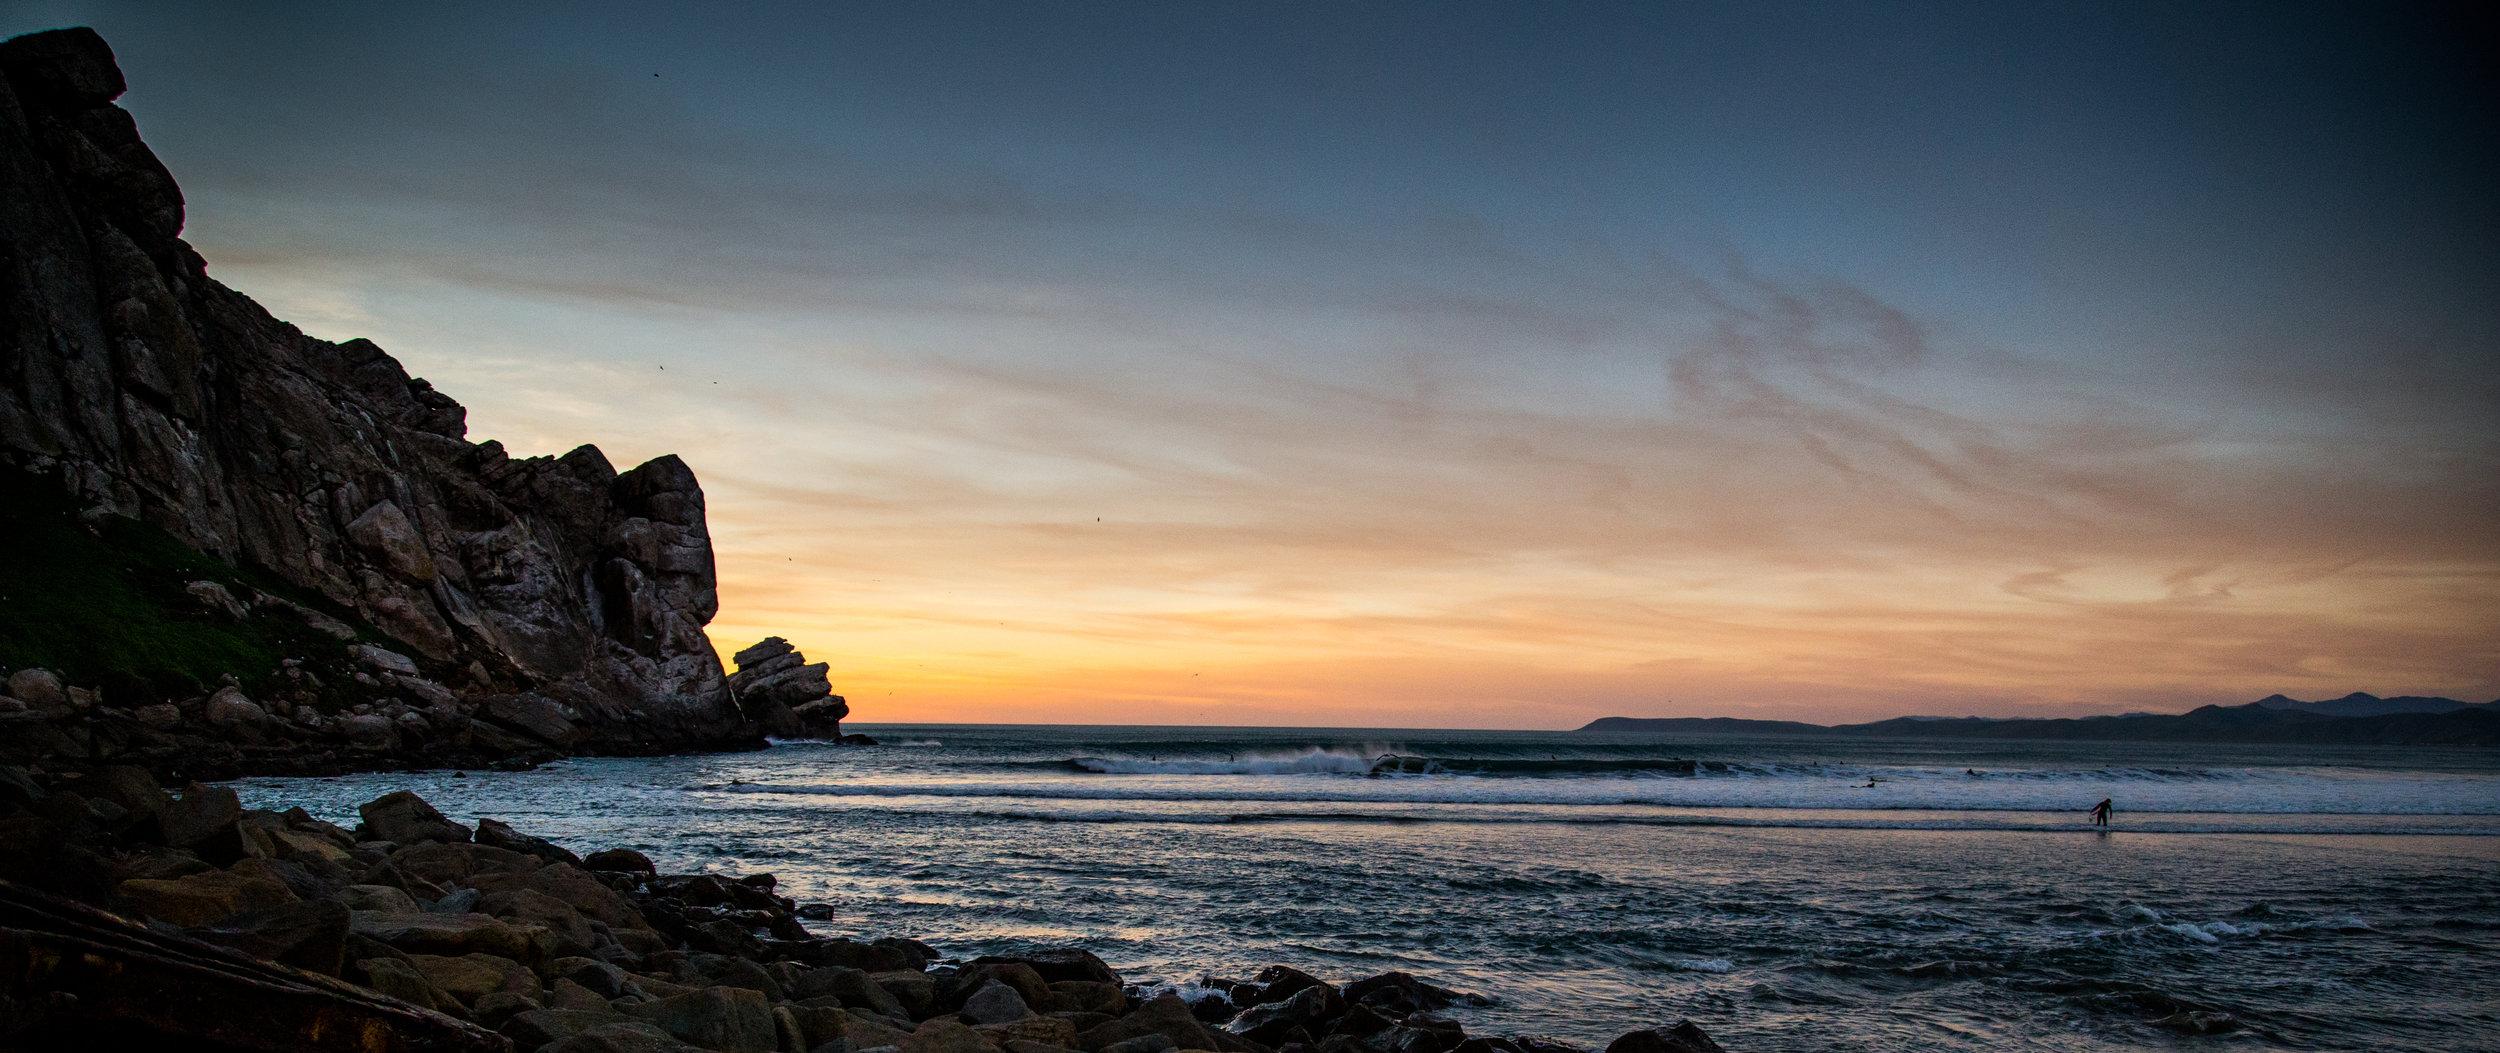 Morro Bay- Ragged Point-8.jpg